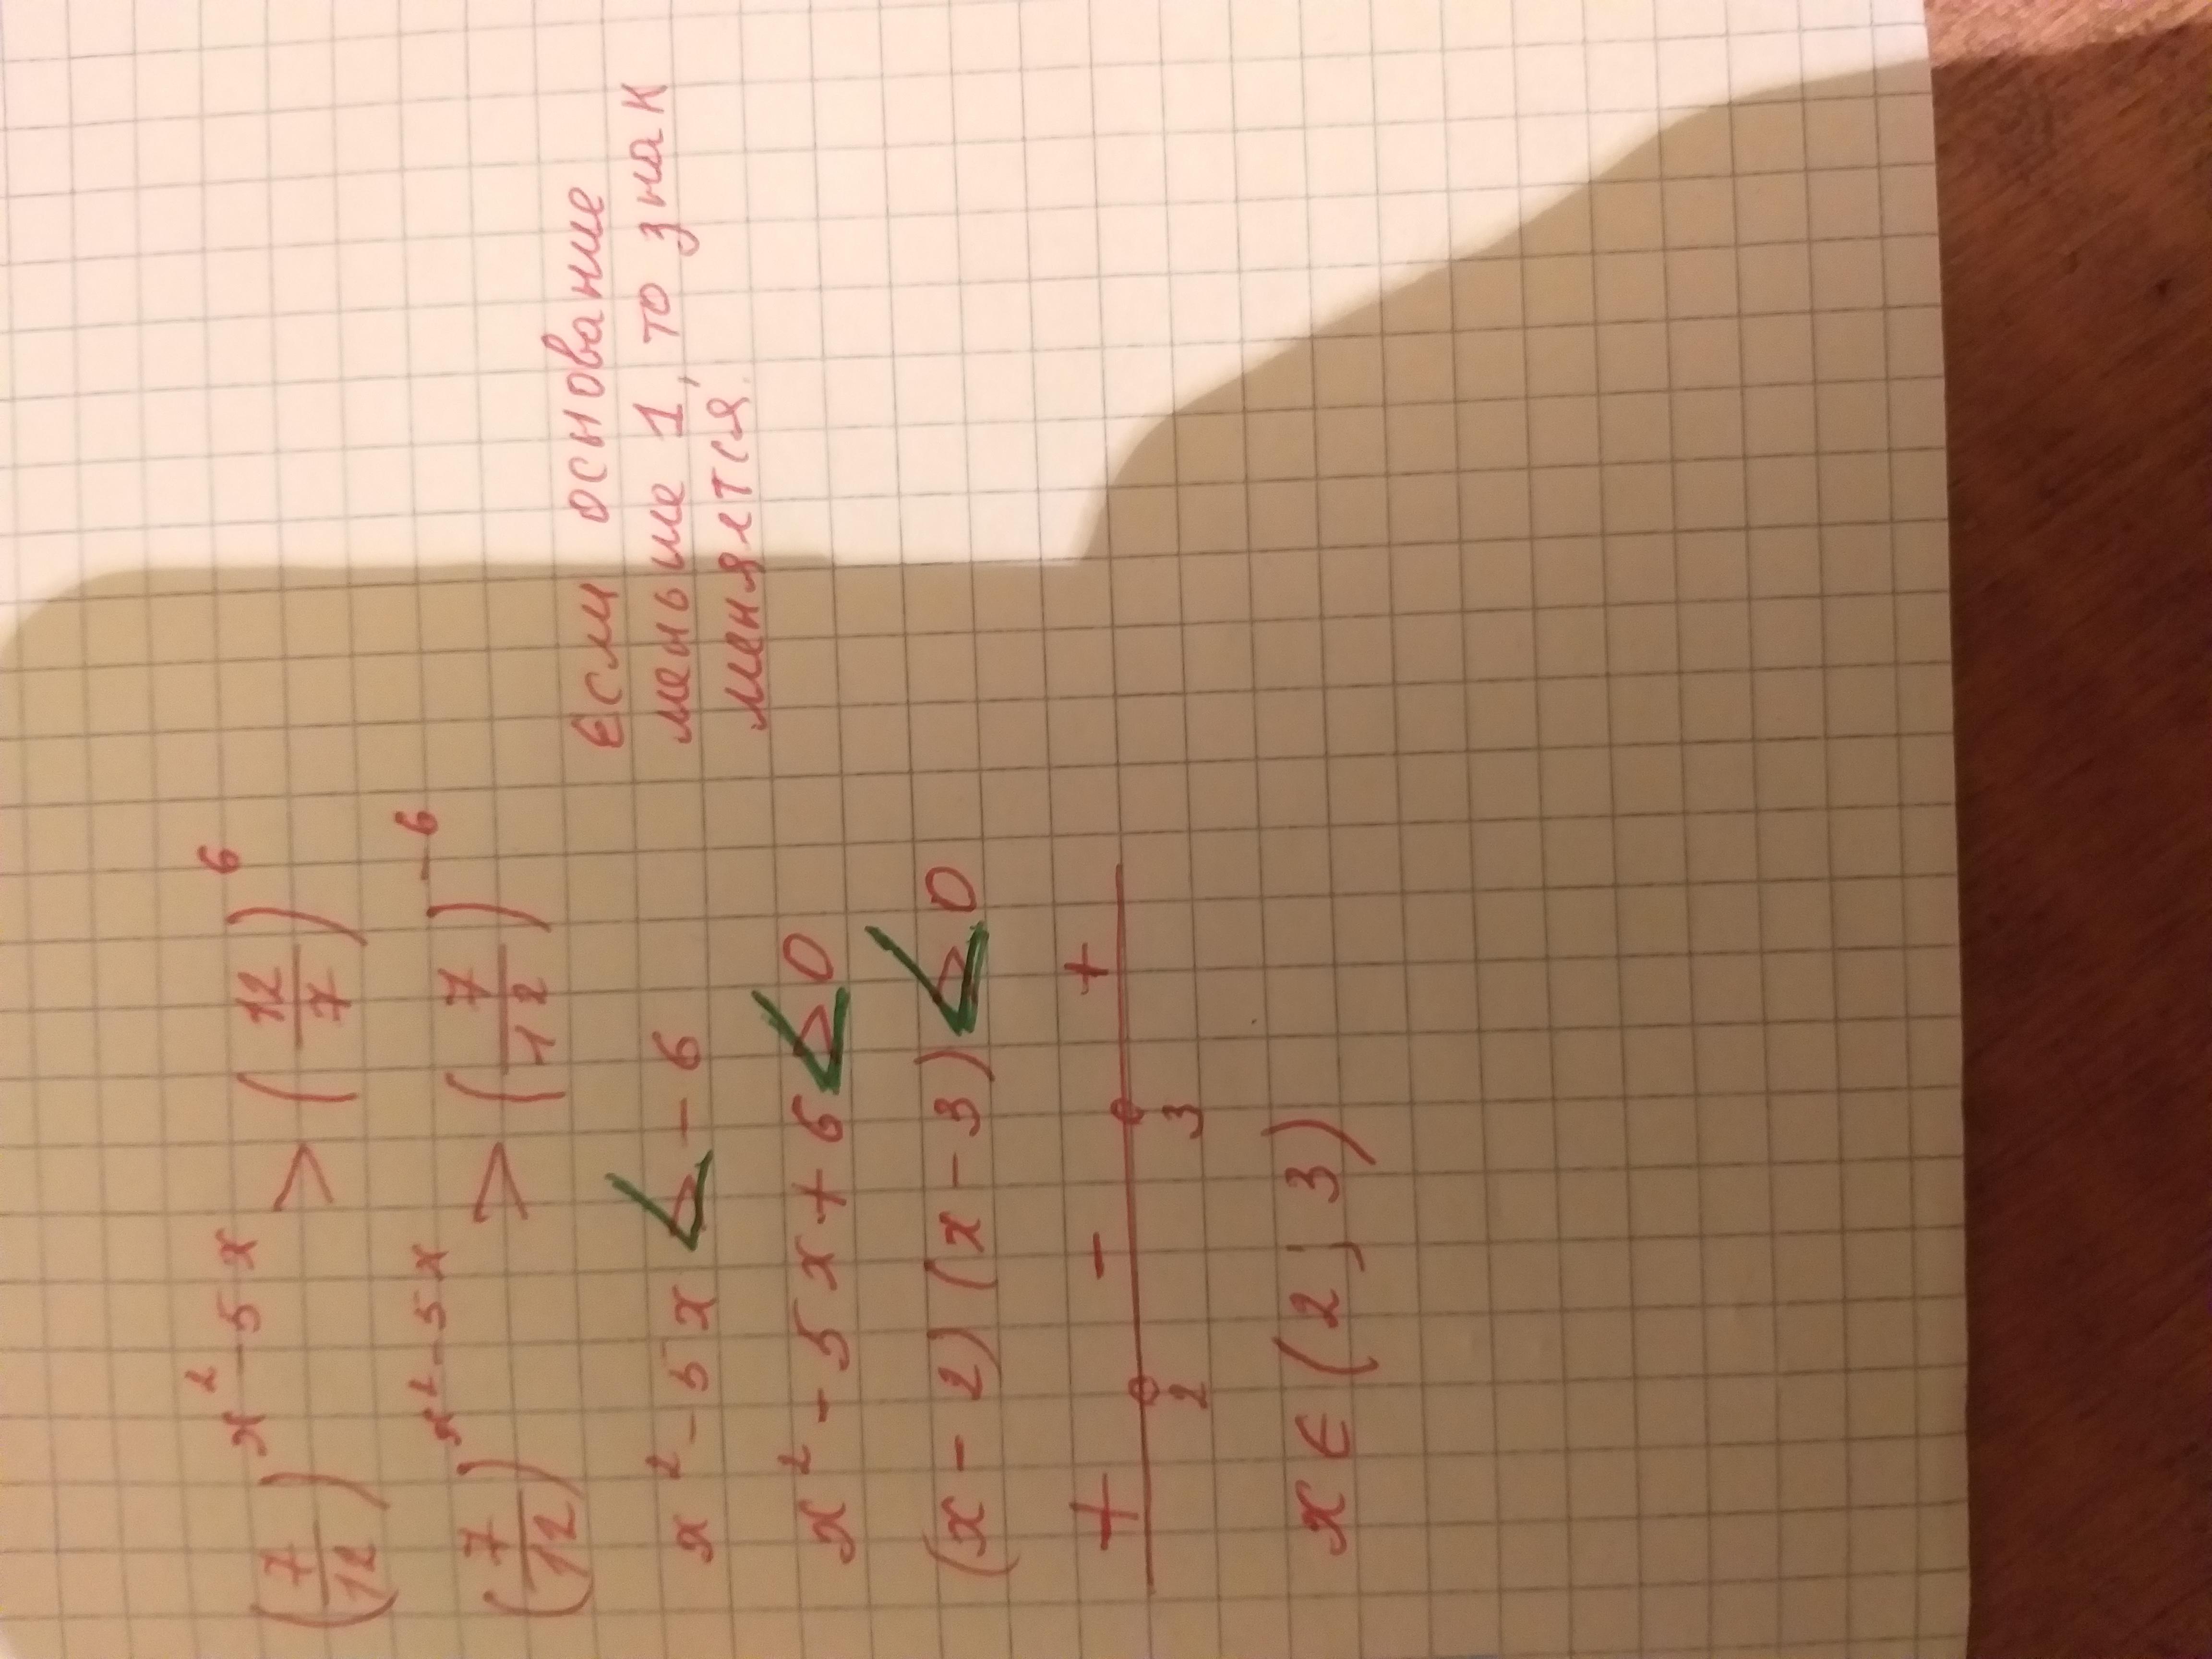 Помогите решить: (7/12)^x^2-5x > (12/7)^6